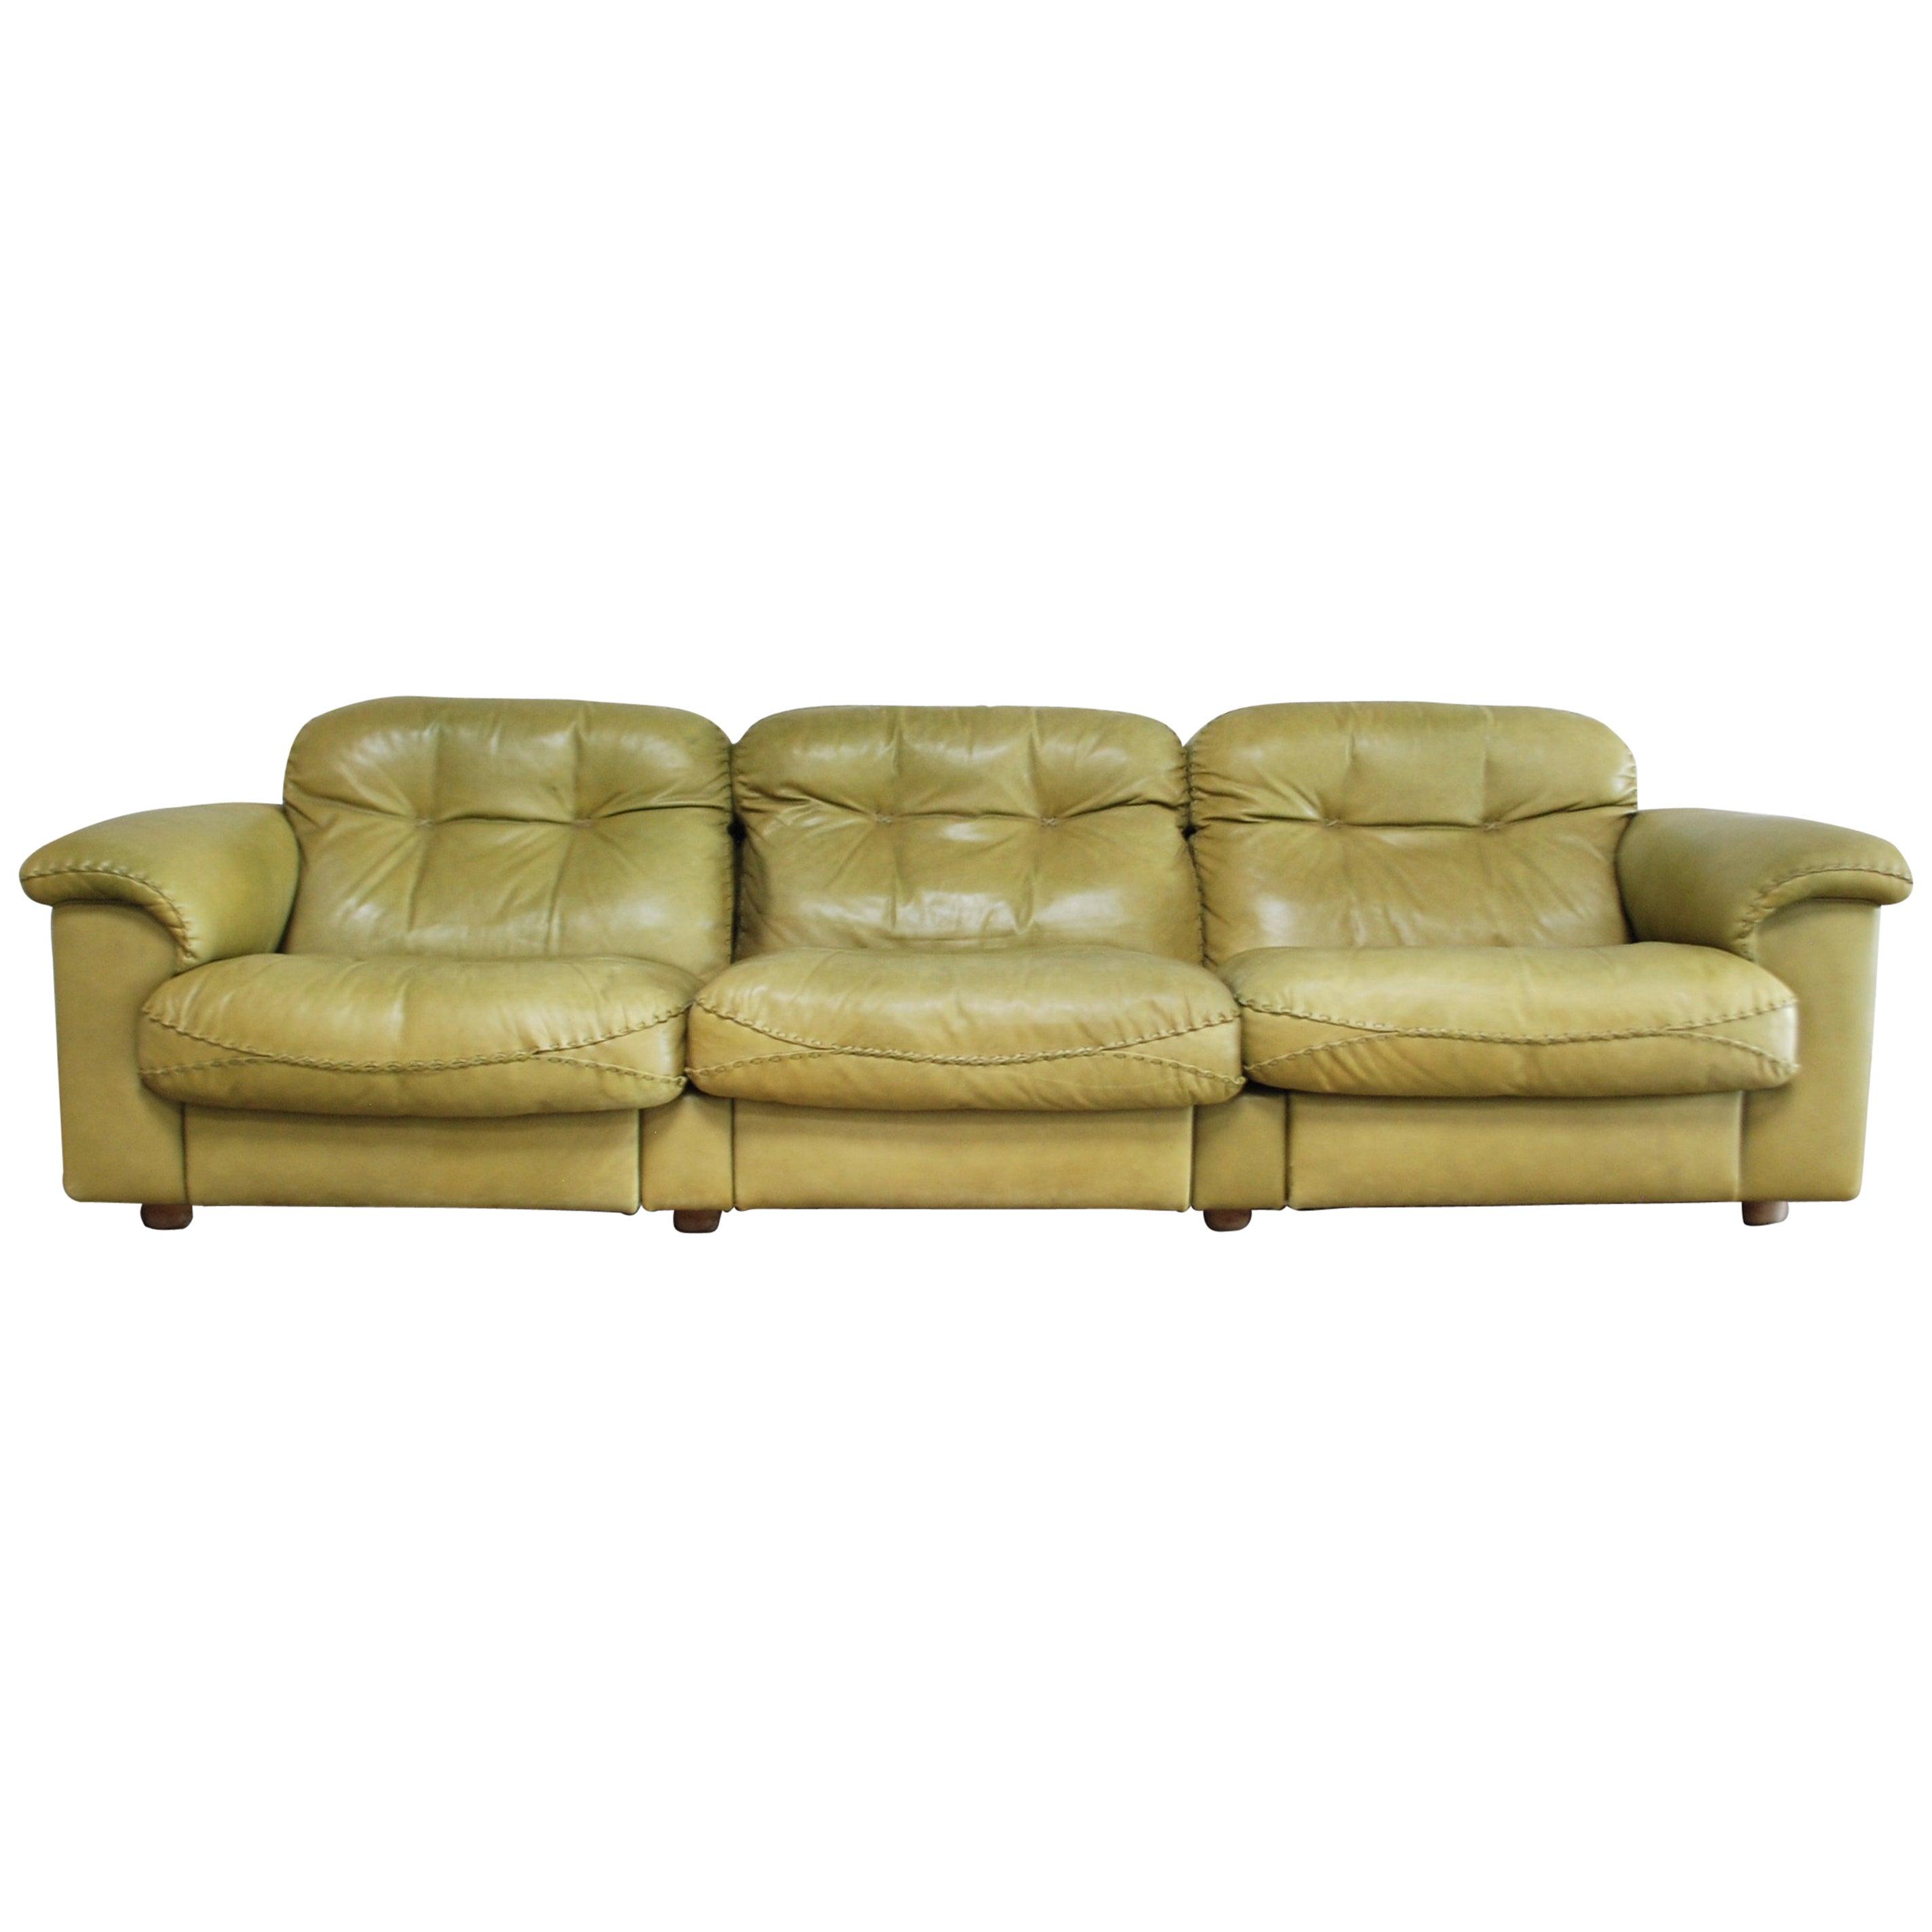 De Sede James Bond Leather Sofa DS 101 Olive Green